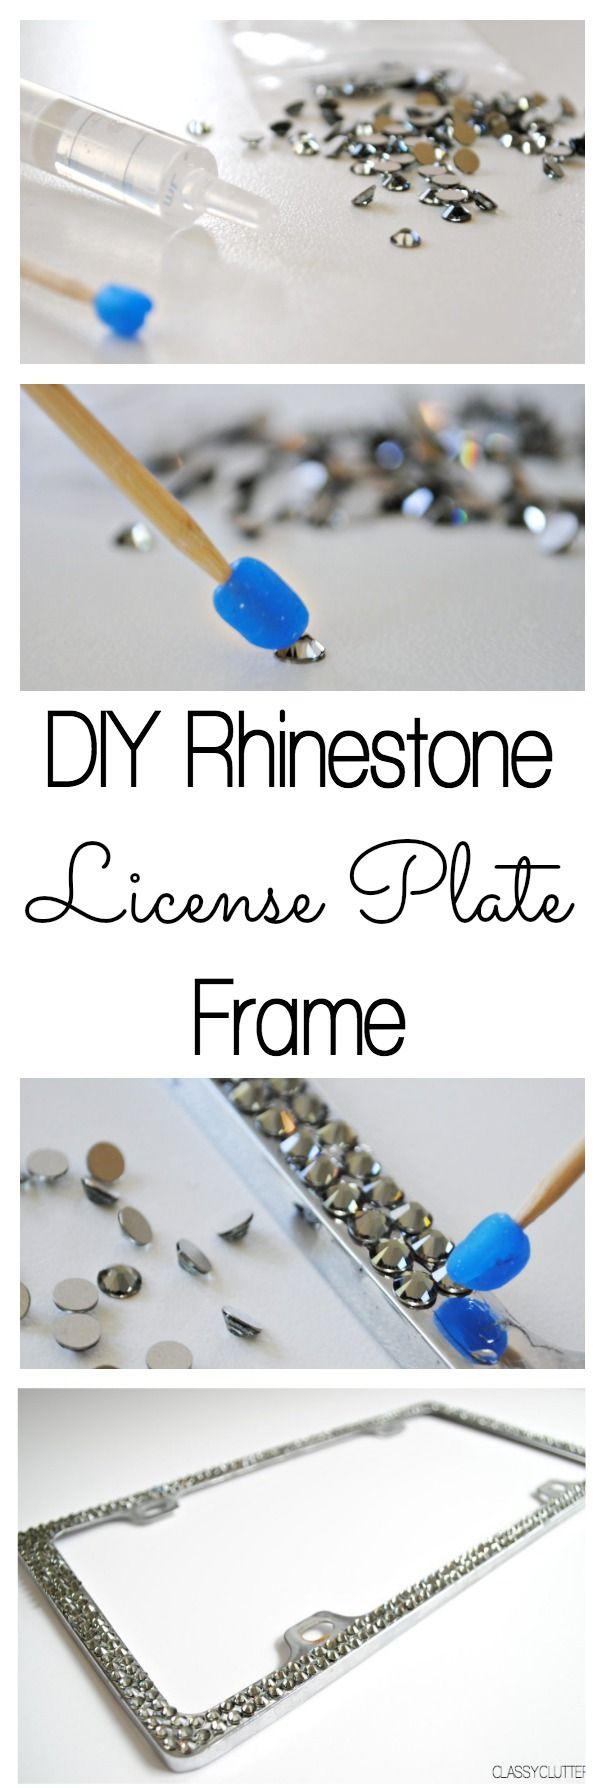 Black 2 Pack Bling Rhinestone License Plate Frames for Women,/Cute Diamond Car License Frame with Bow